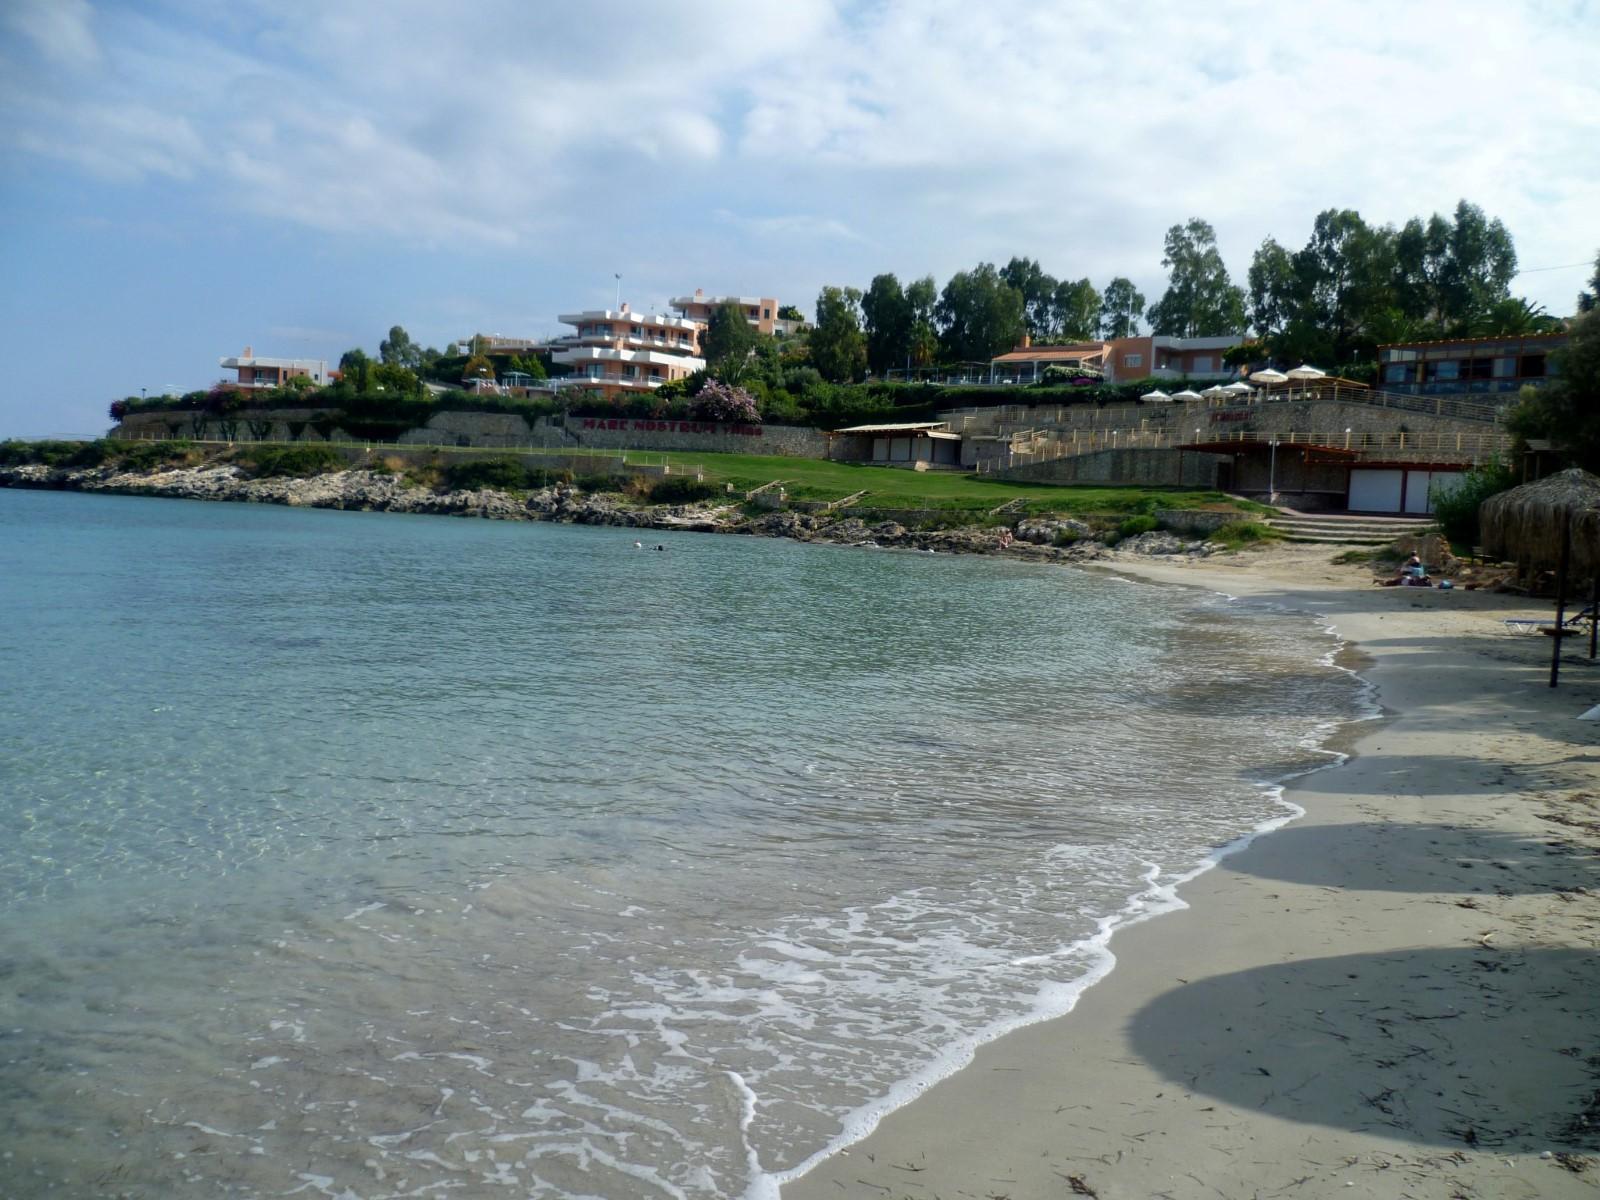 Loutraki Beach Travel Guide for Island Crete Greece